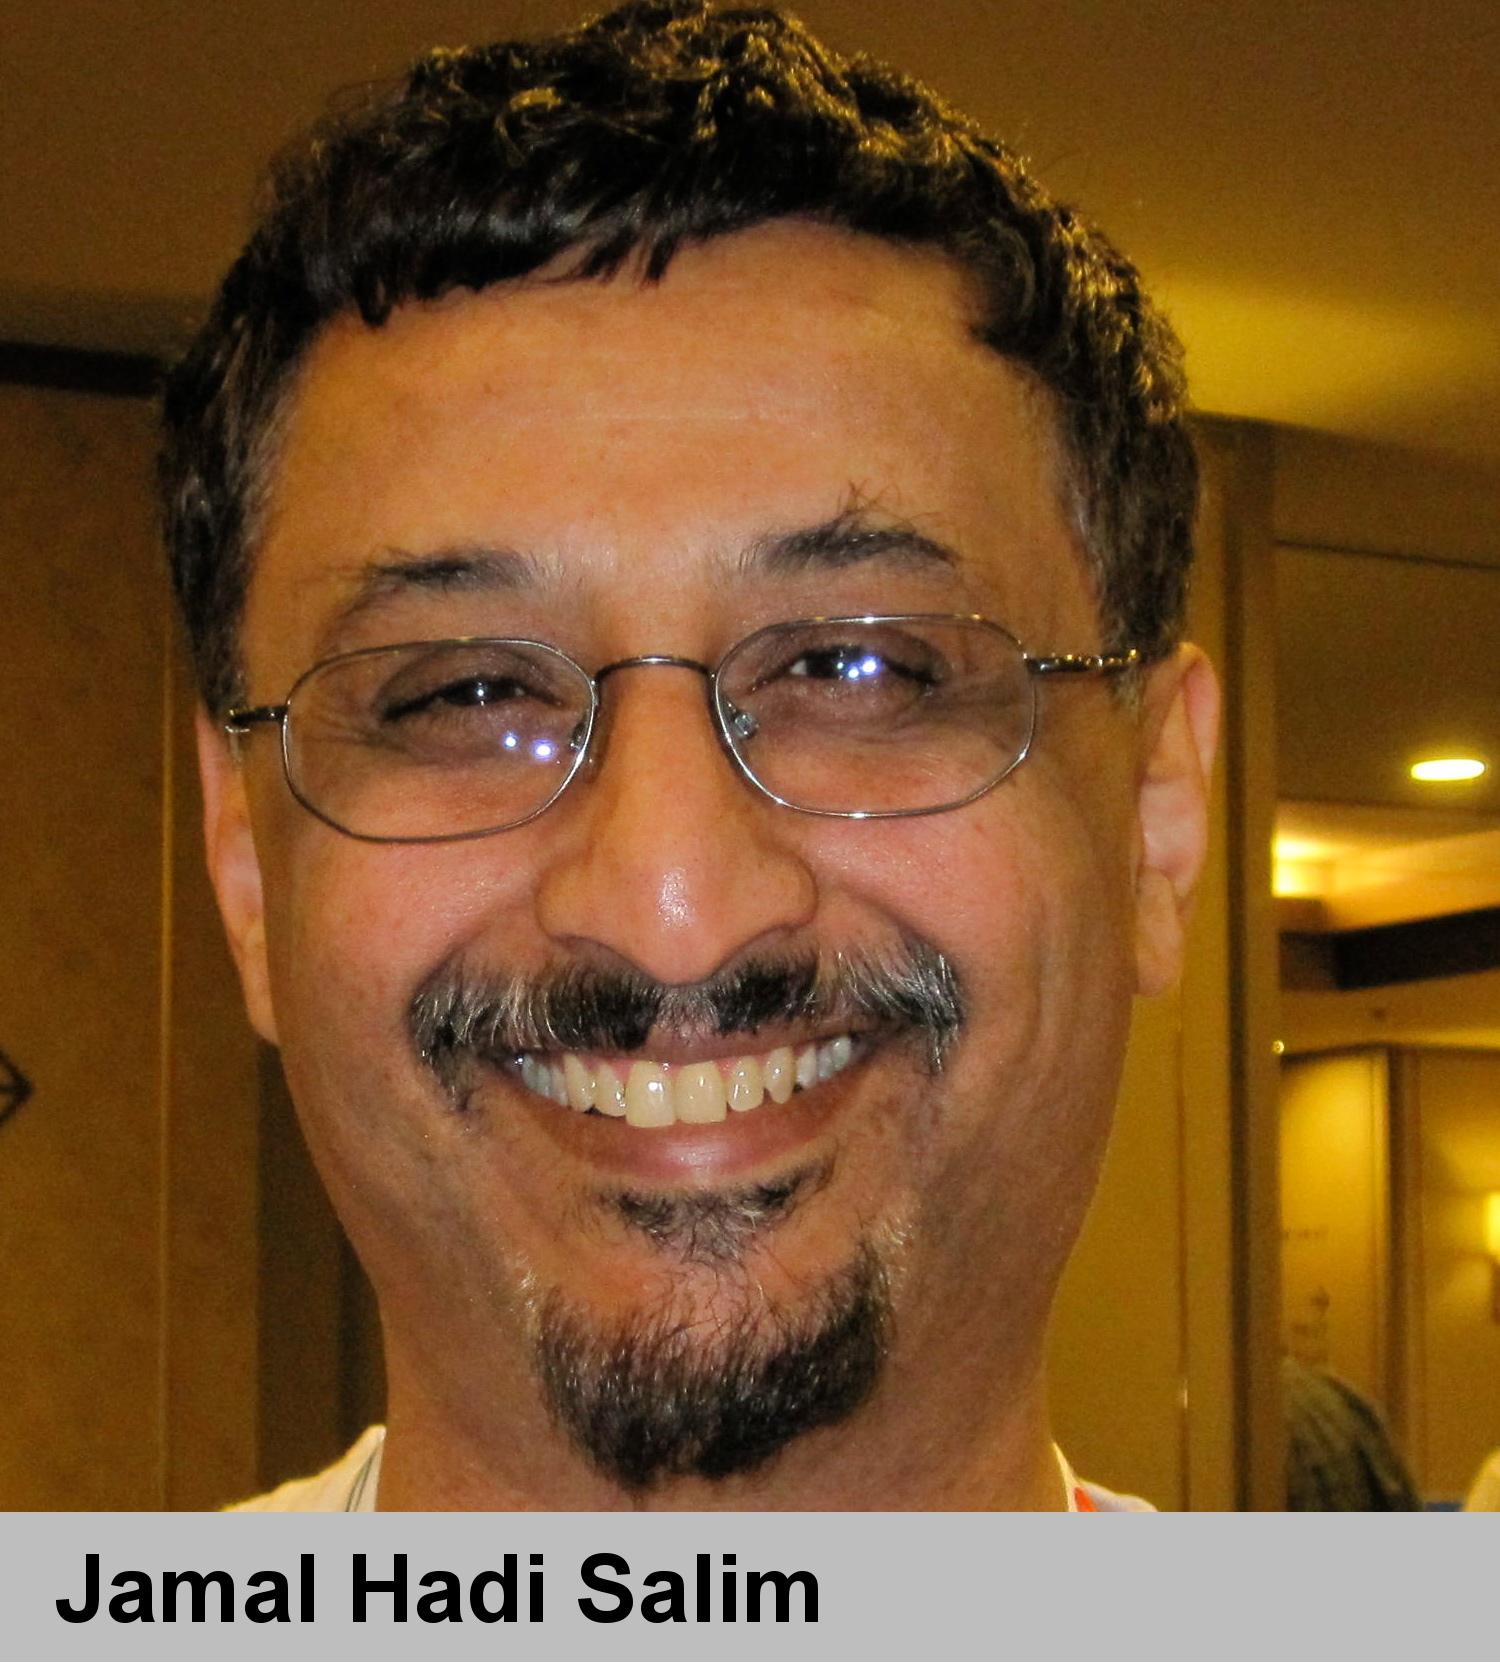 Photo of Jamal Hadi Salim